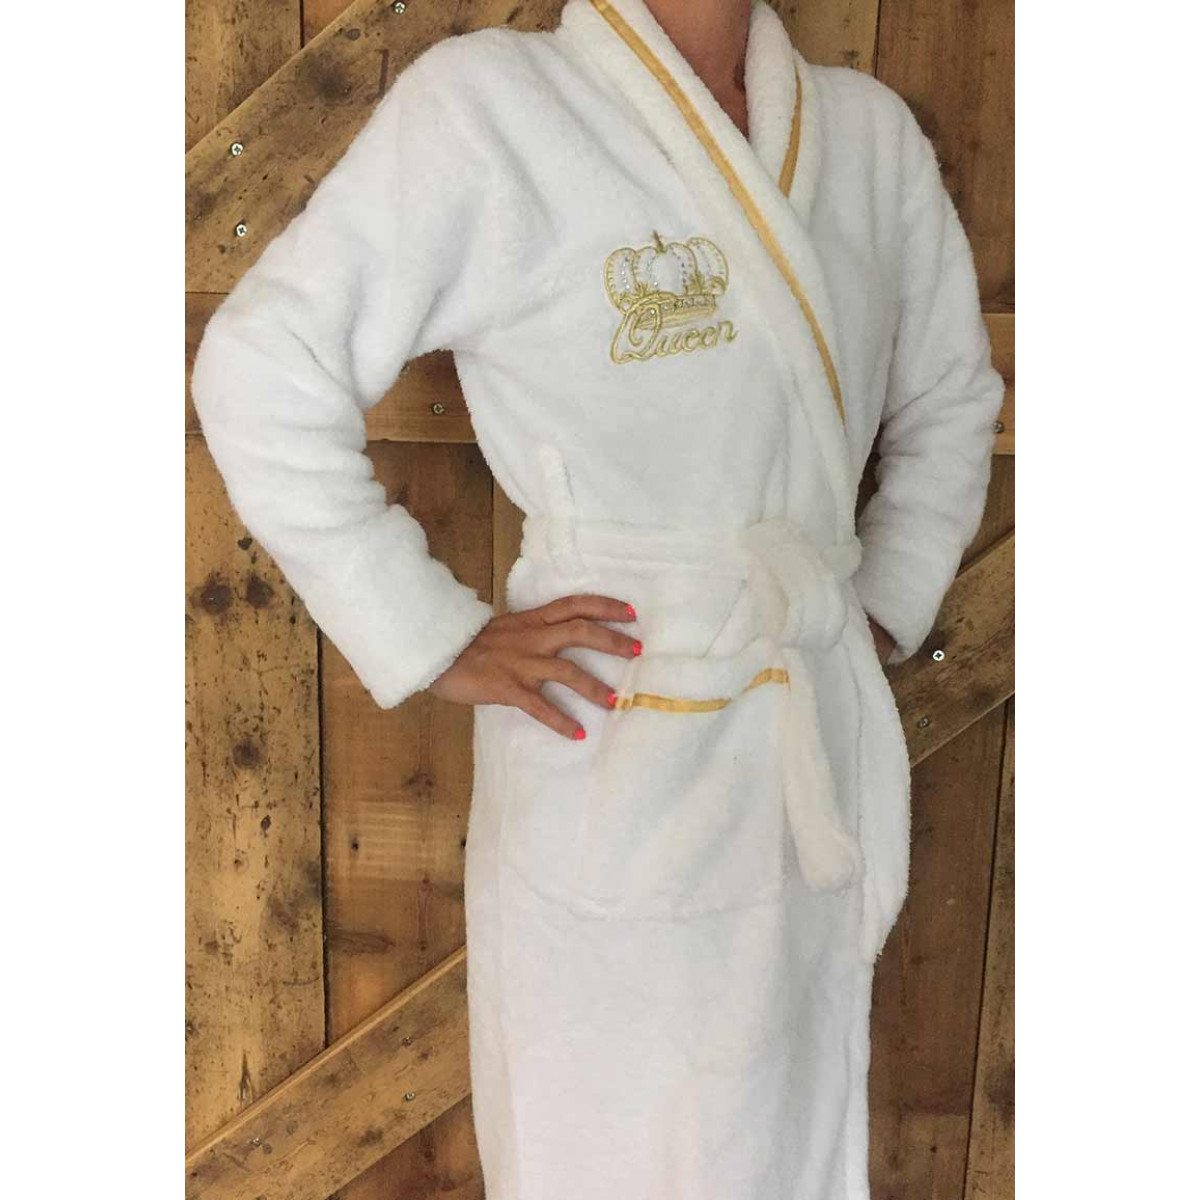 Luxe witte badjas met kroon